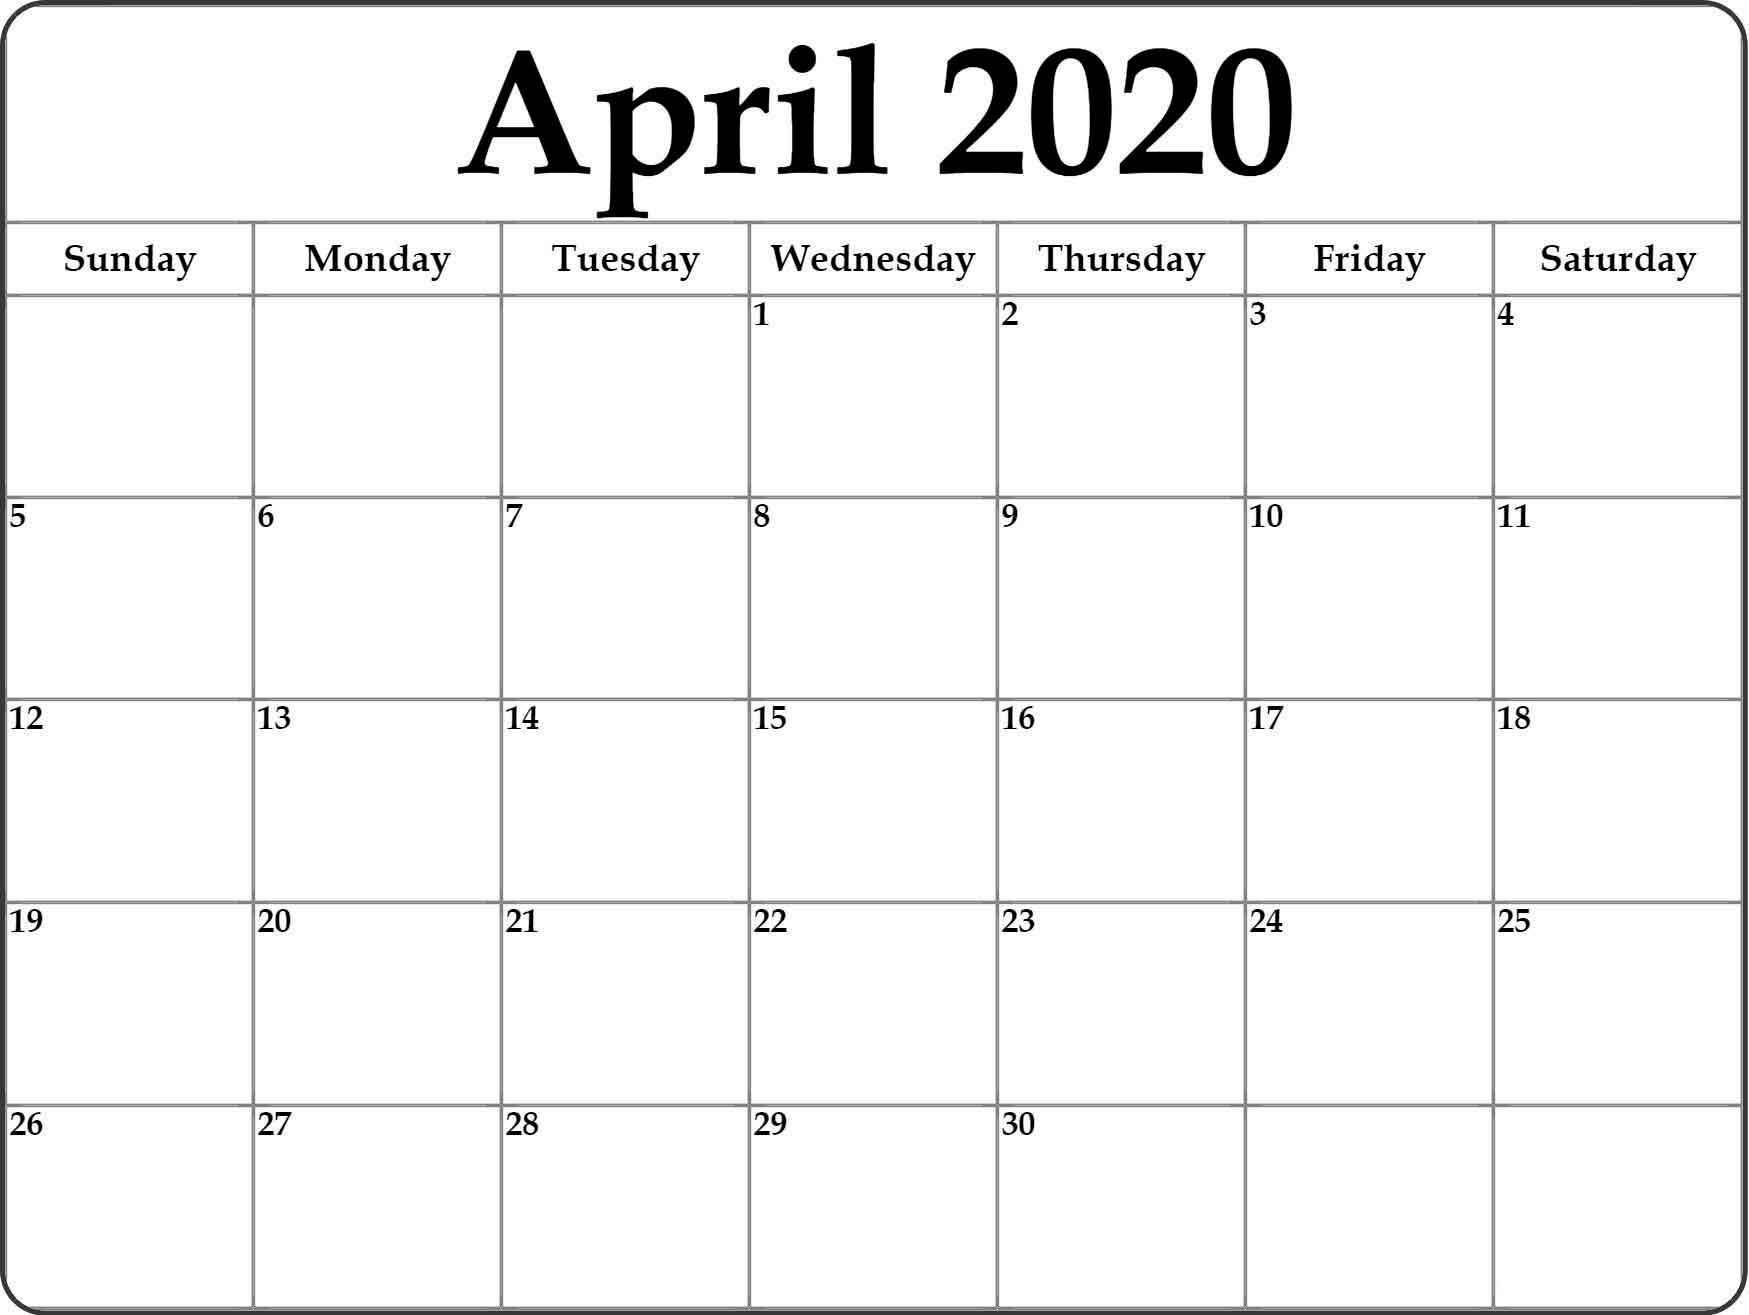 Google Calendar April 2020 - Free Printable Calendar Templates